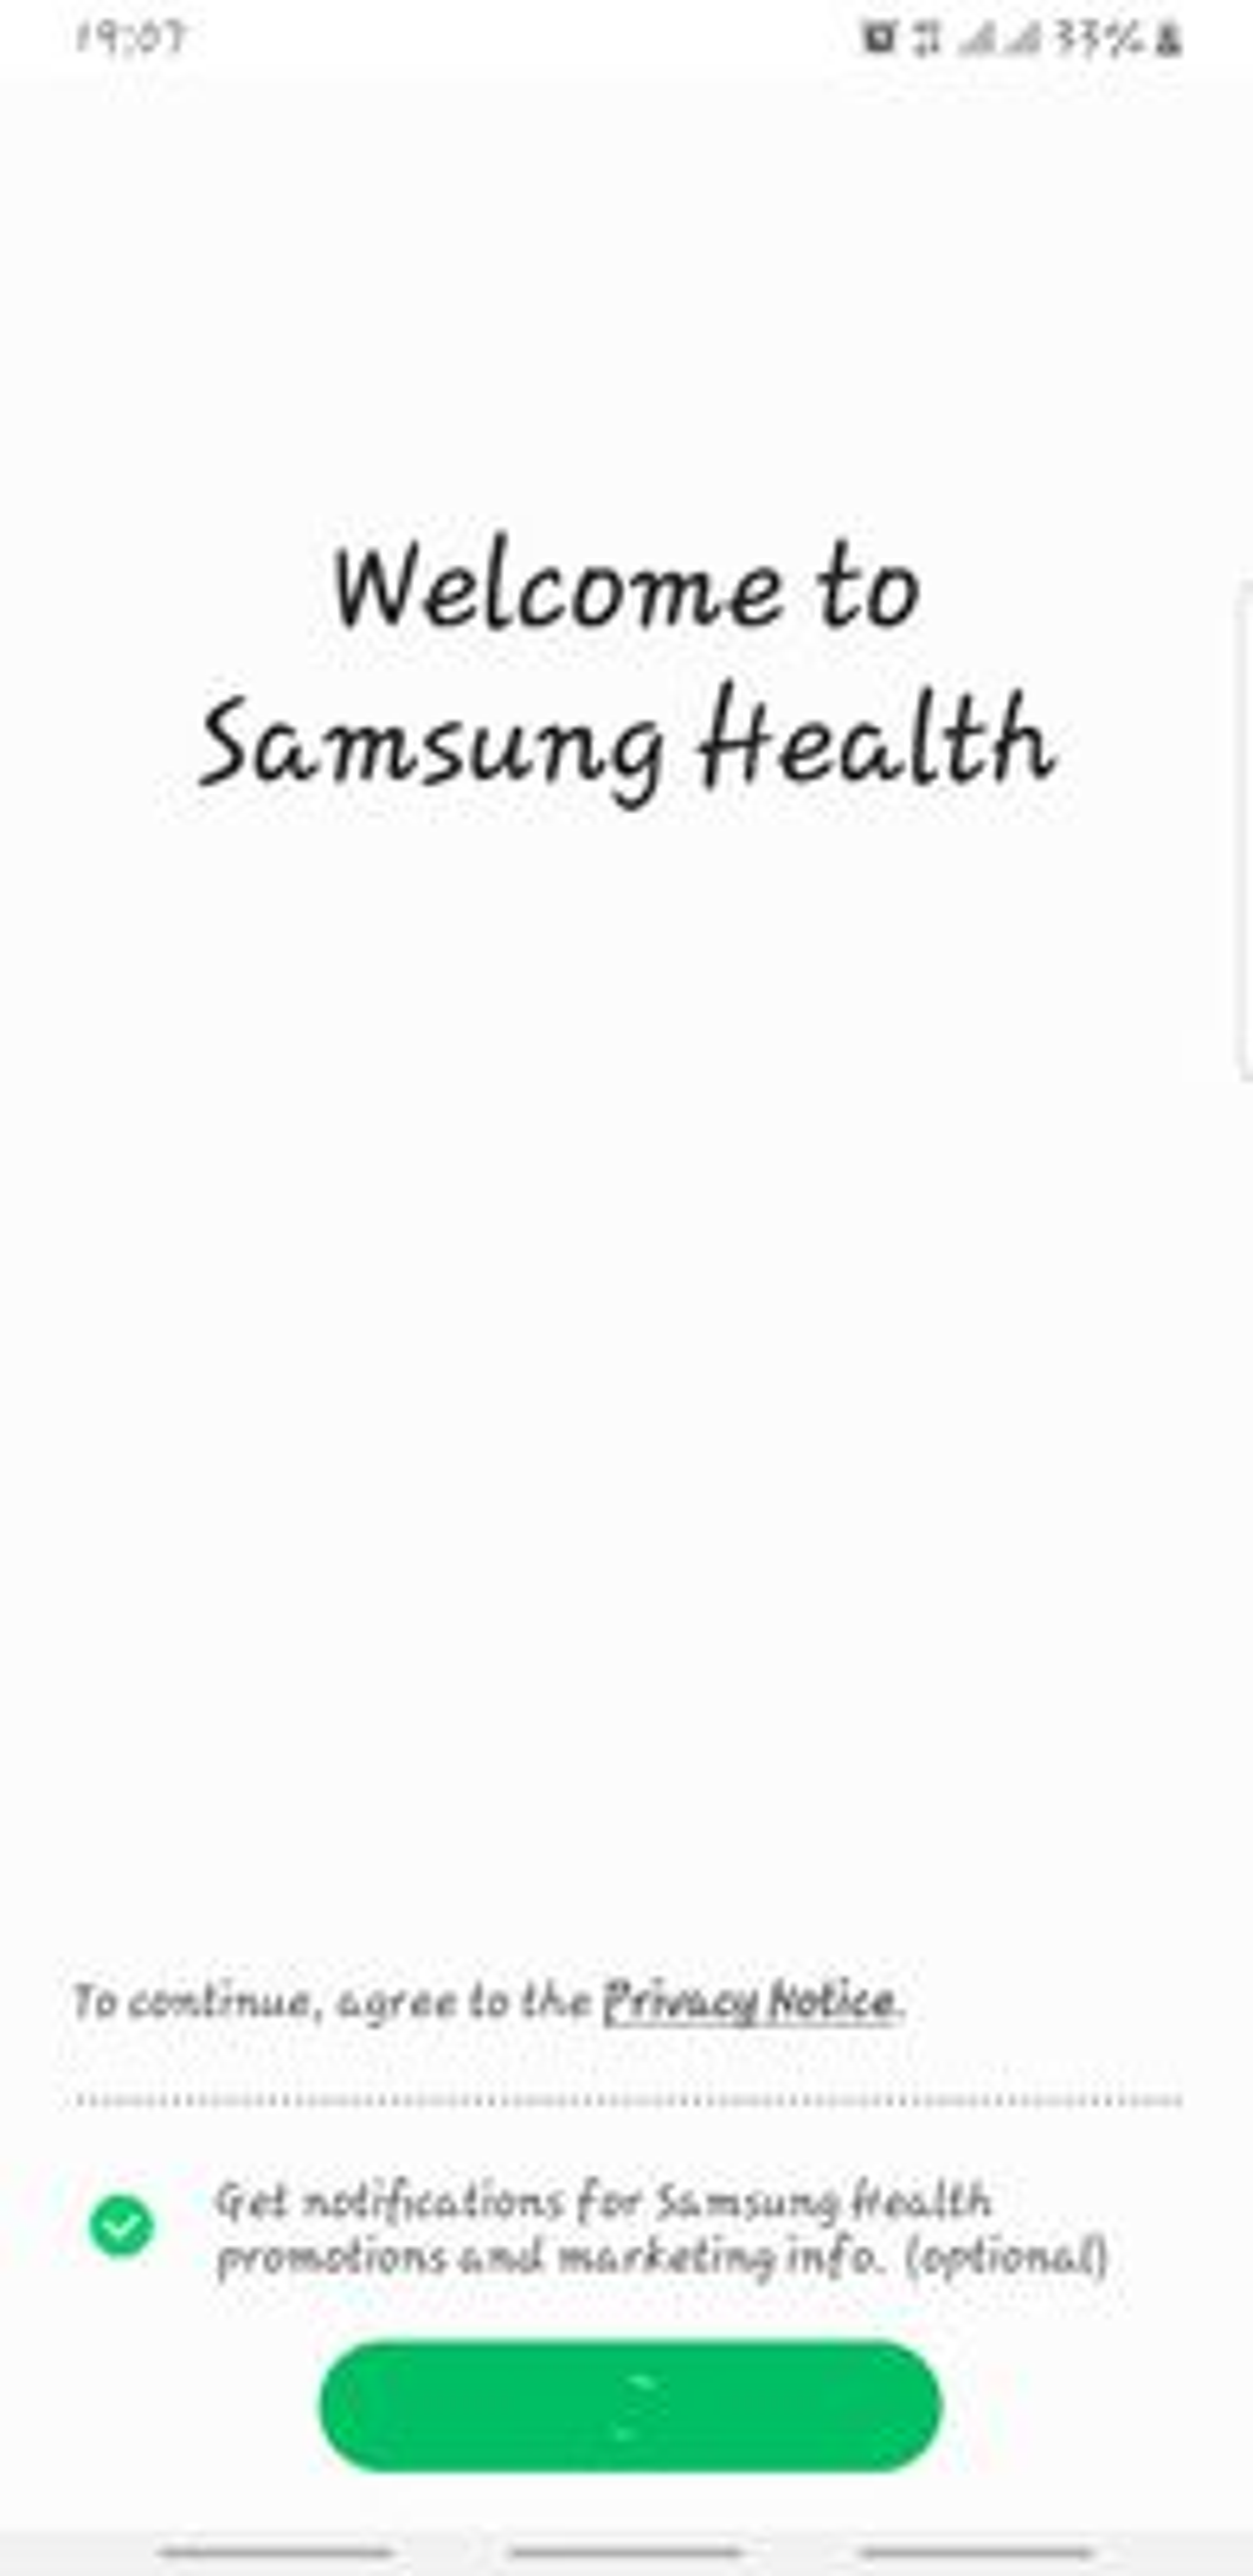 Screenshot_20210722-190708_Samsung Health.jpg